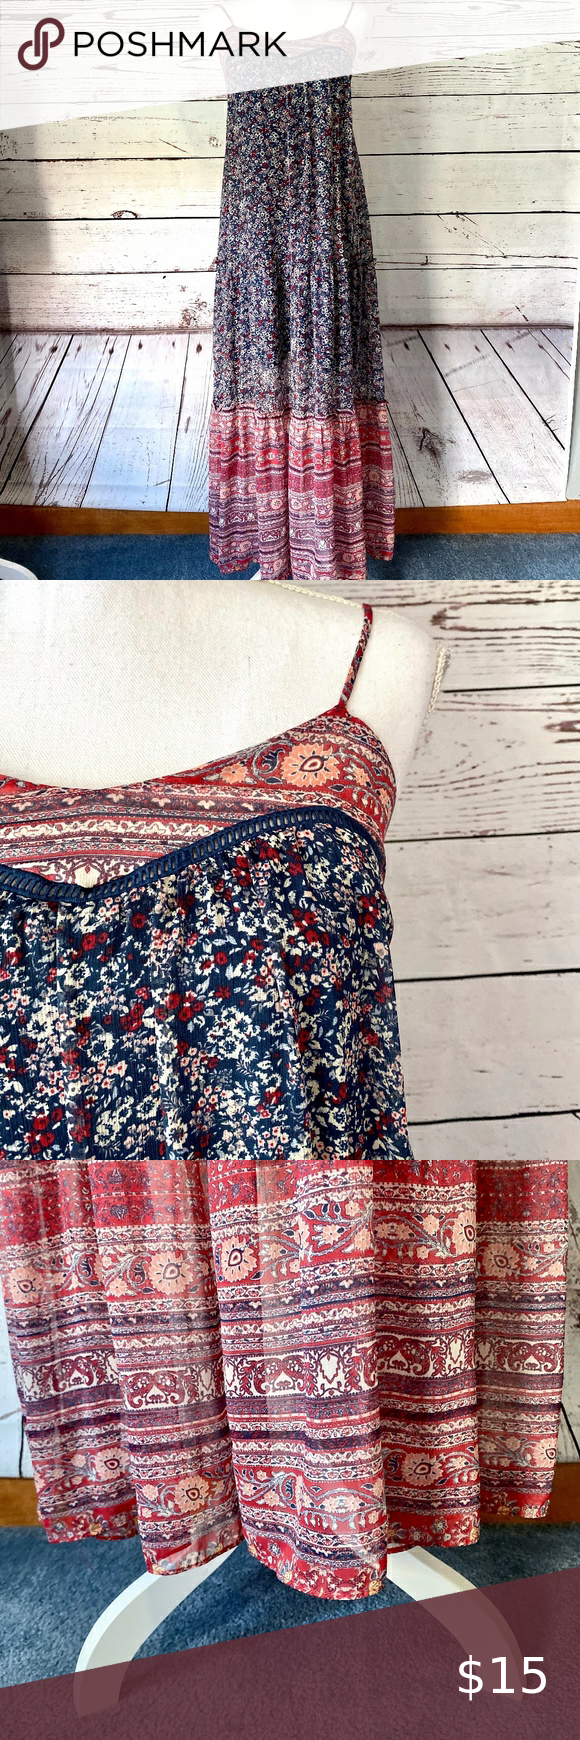 Women S Xhilaration Maxi Dress S In 2020 Xhilaration Maxi Dress Dresses [ 1740 x 580 Pixel ]